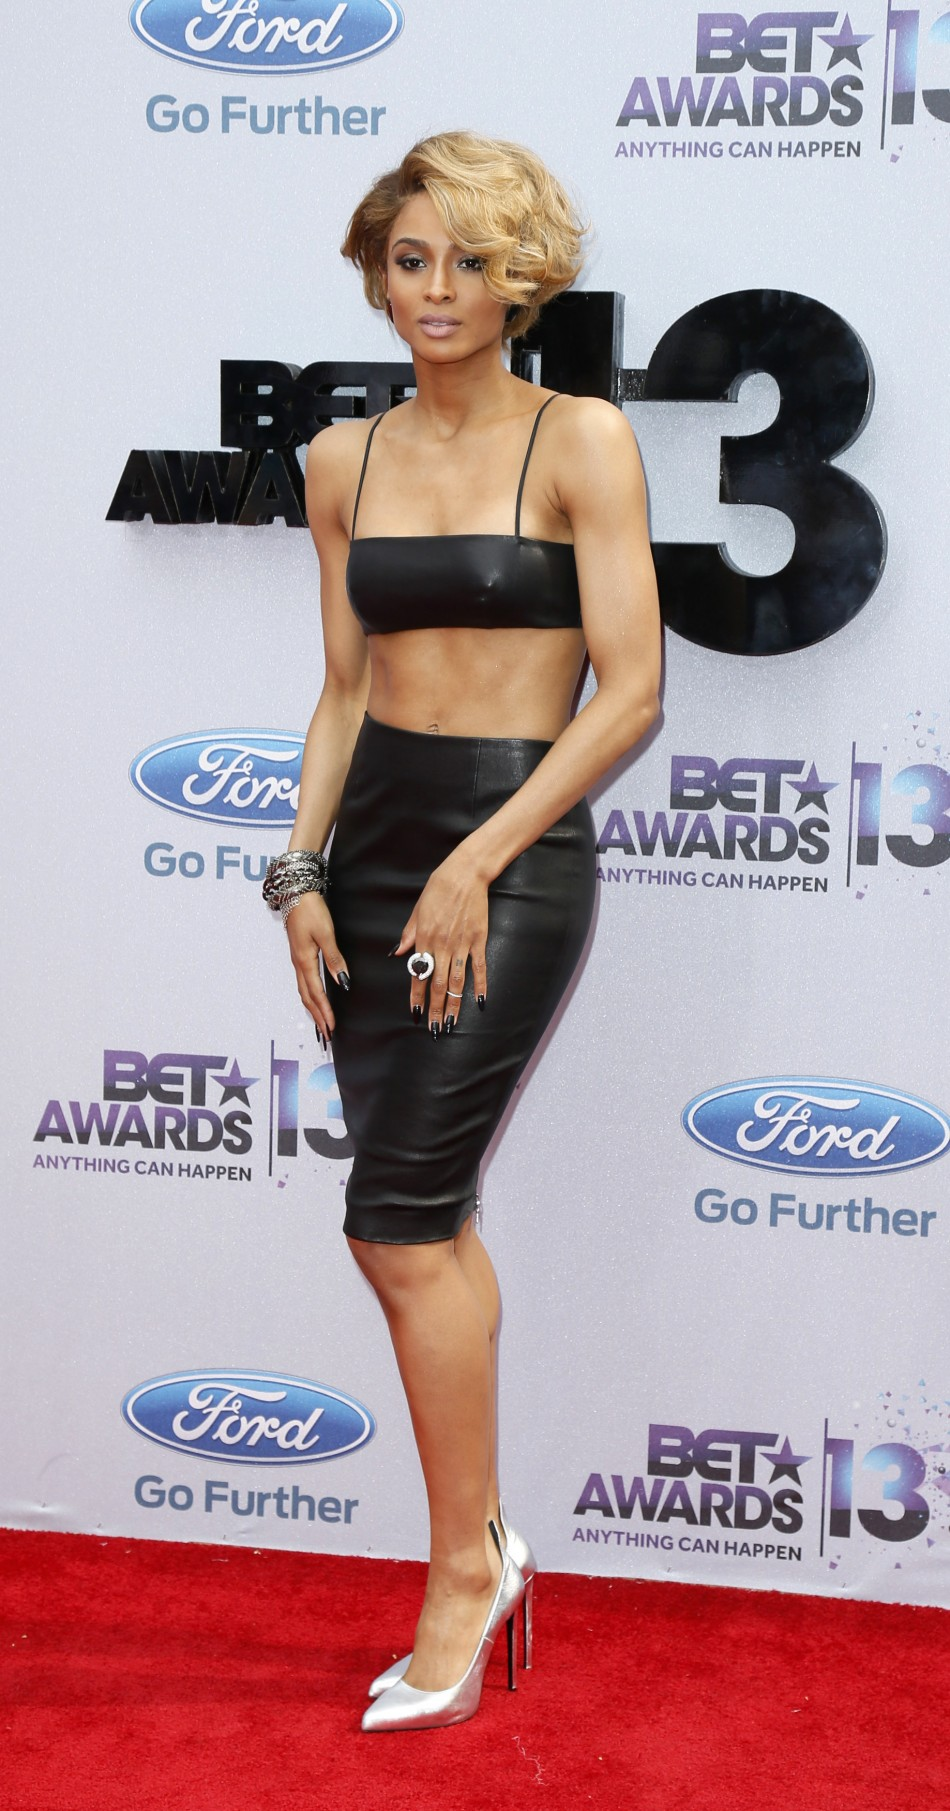 Singer Ciara arrives at the 2013 BET Awards in Los Angeles, California June 30, 2013.